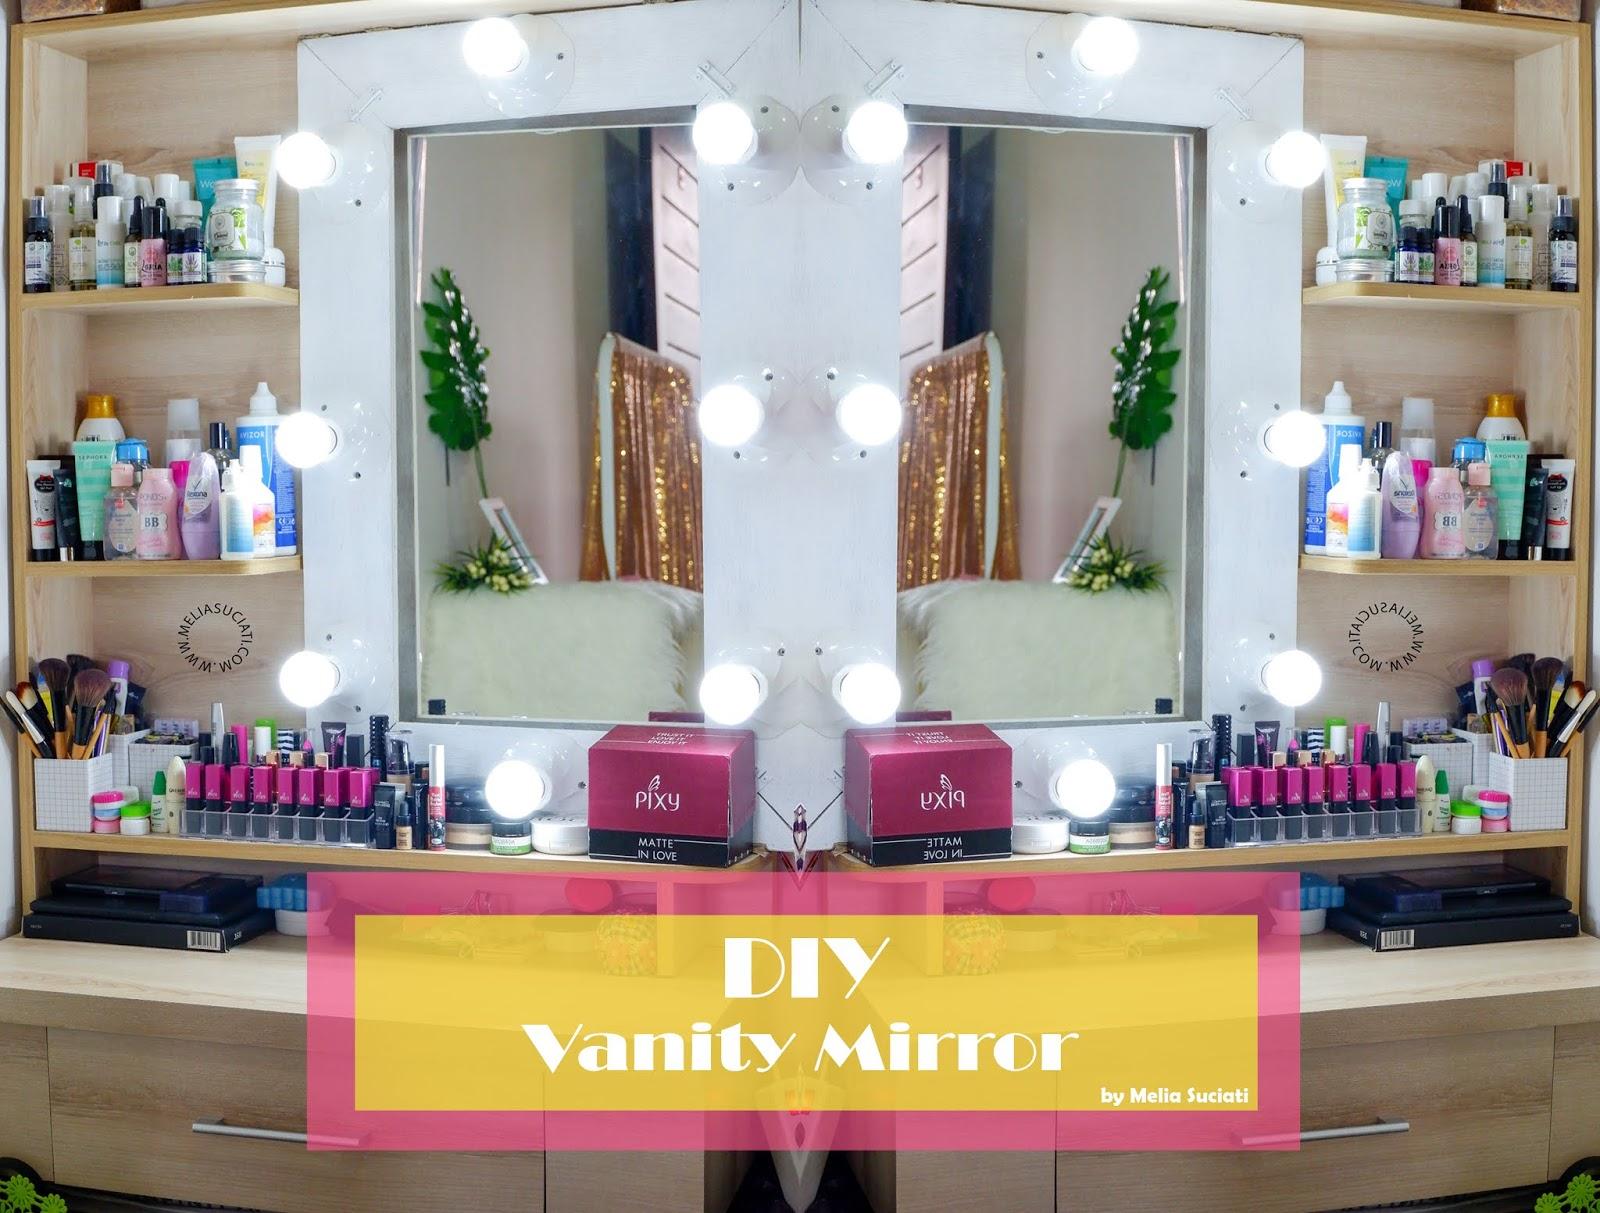 DIY Vanity Mirror Murah Meriah